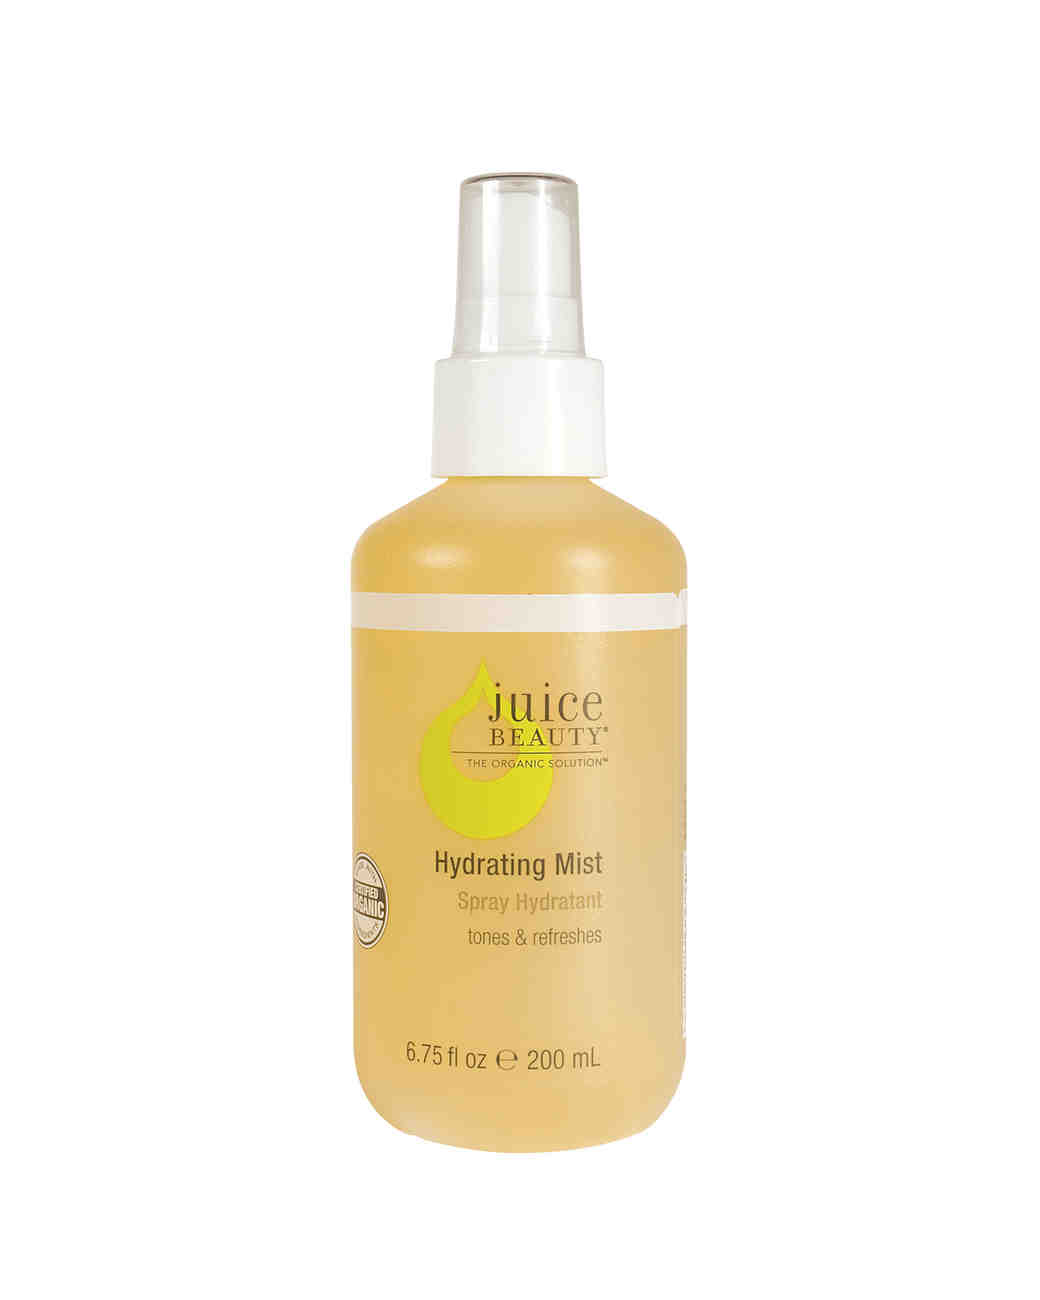 juice-beauty-hydrating-mist-spray-0314.jpg